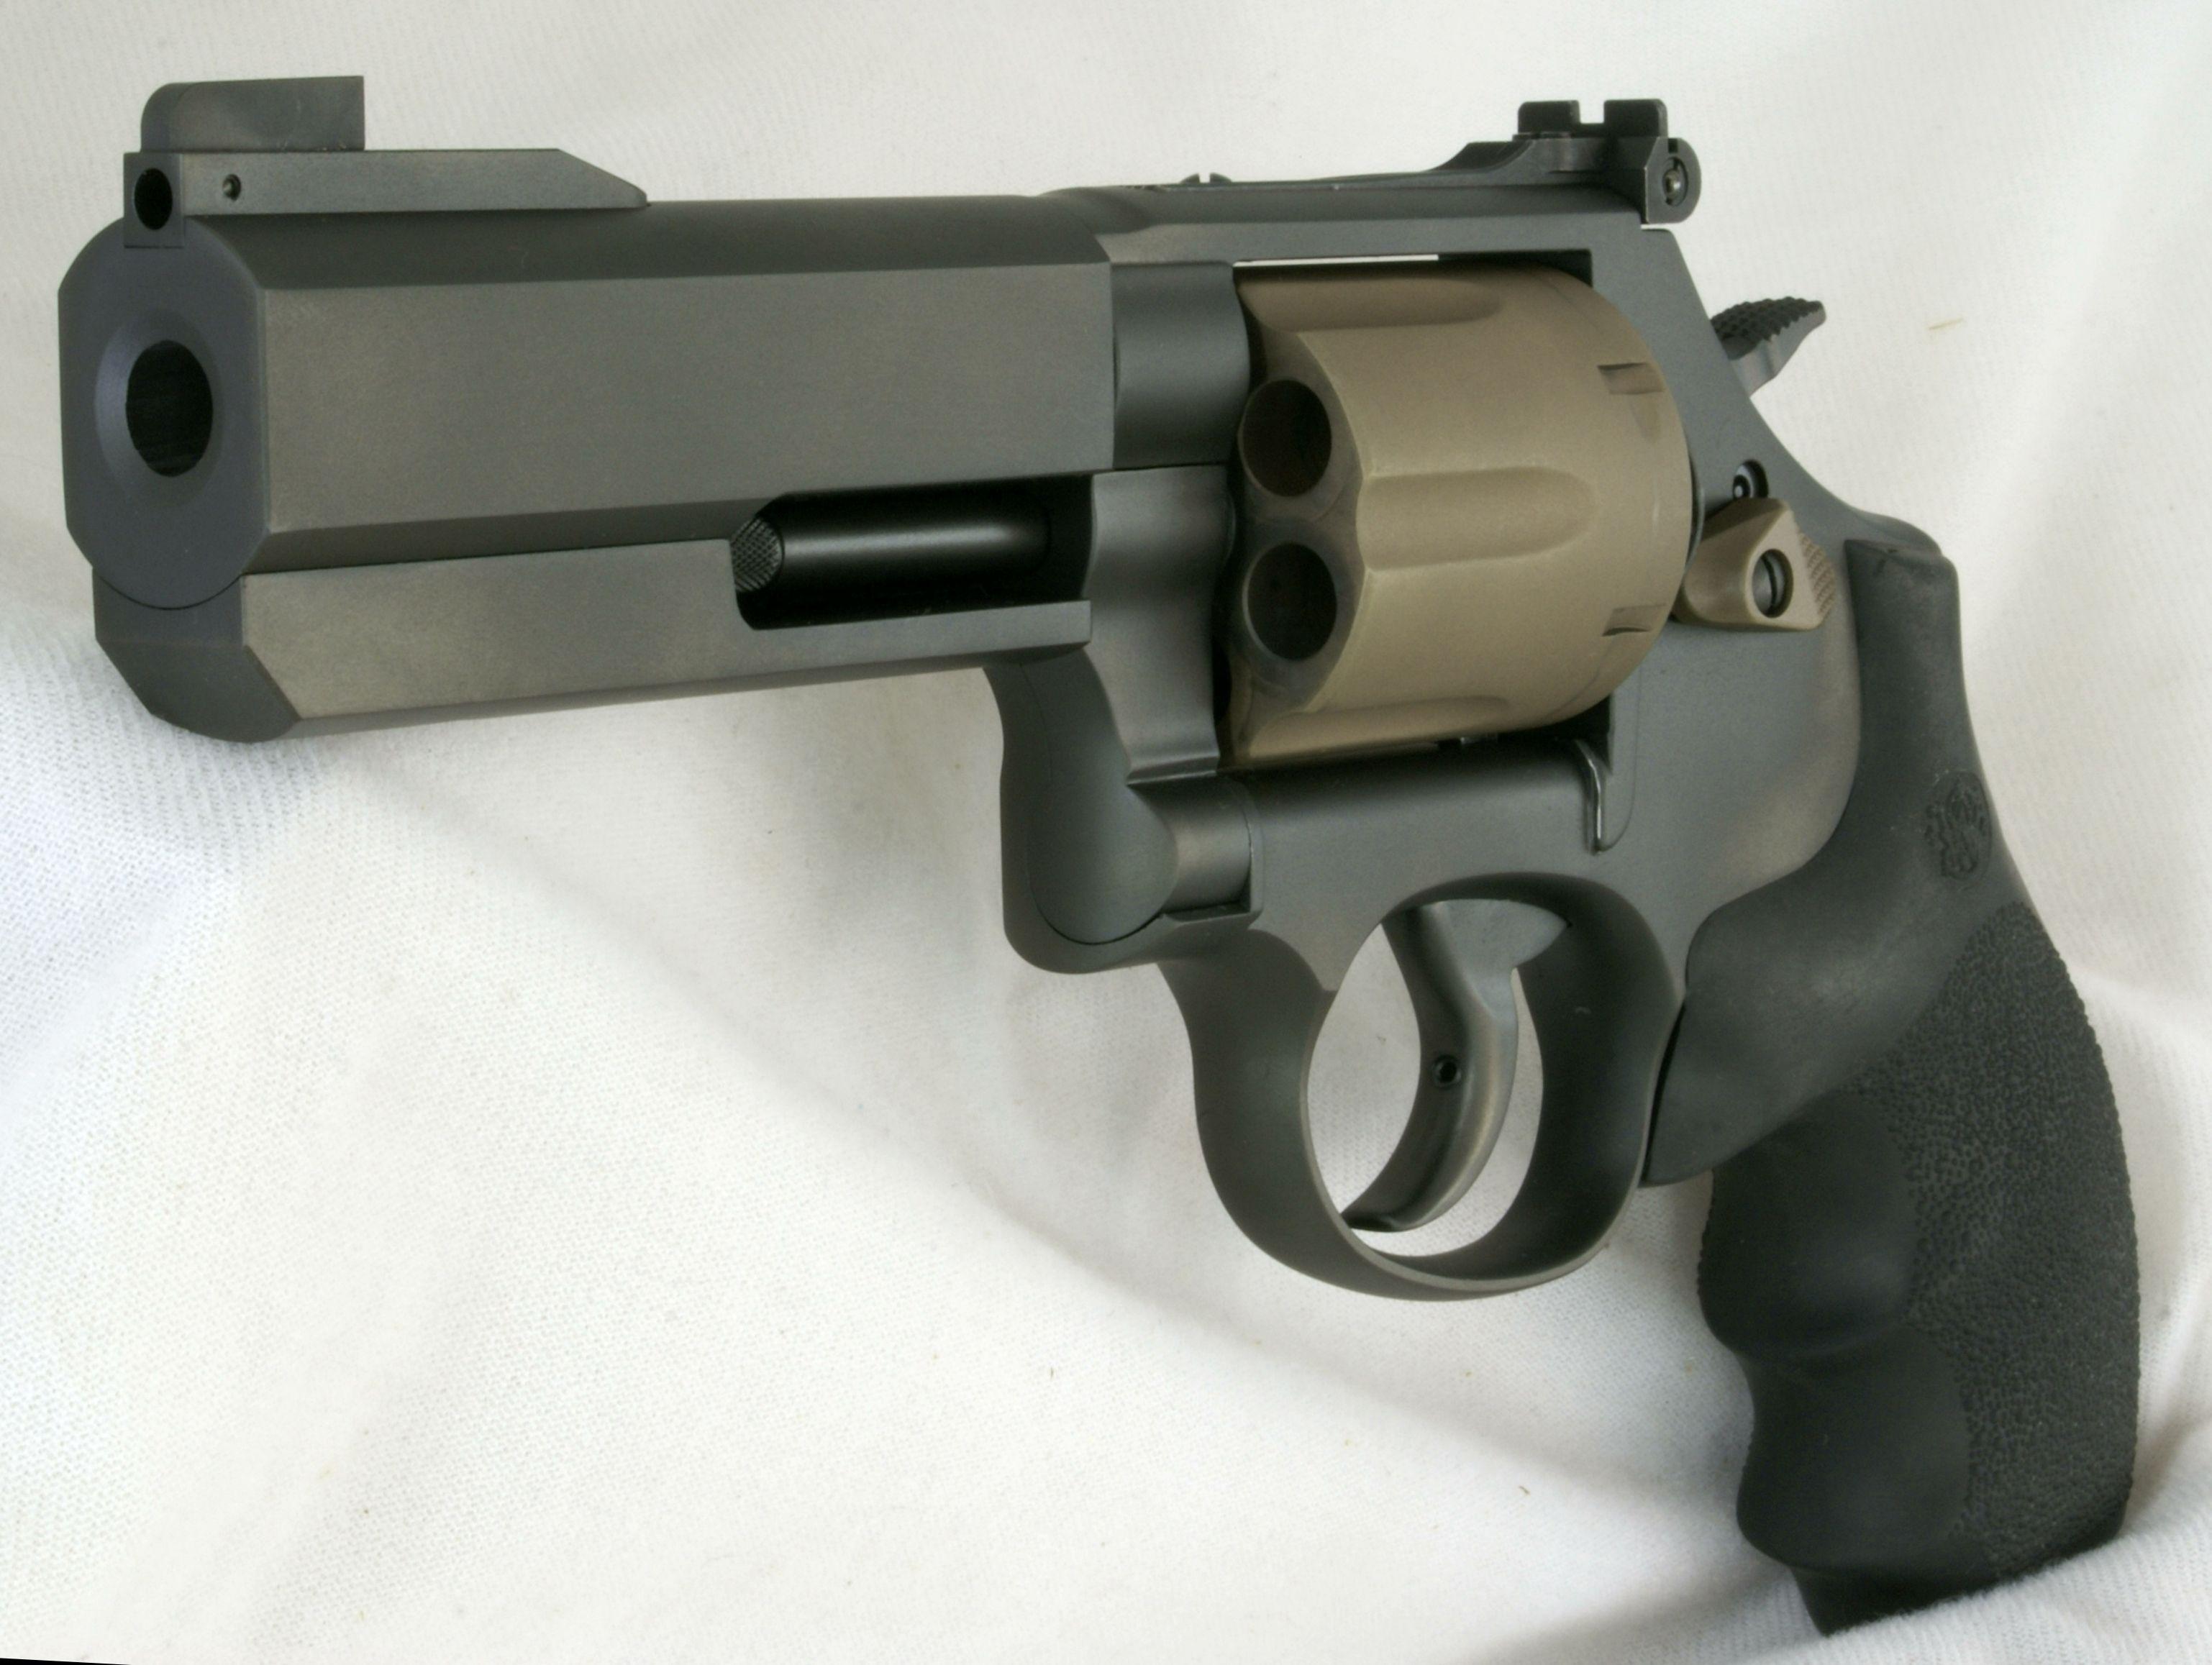 Clark Custom Smith Wesson 686 357 Magnum Revolver